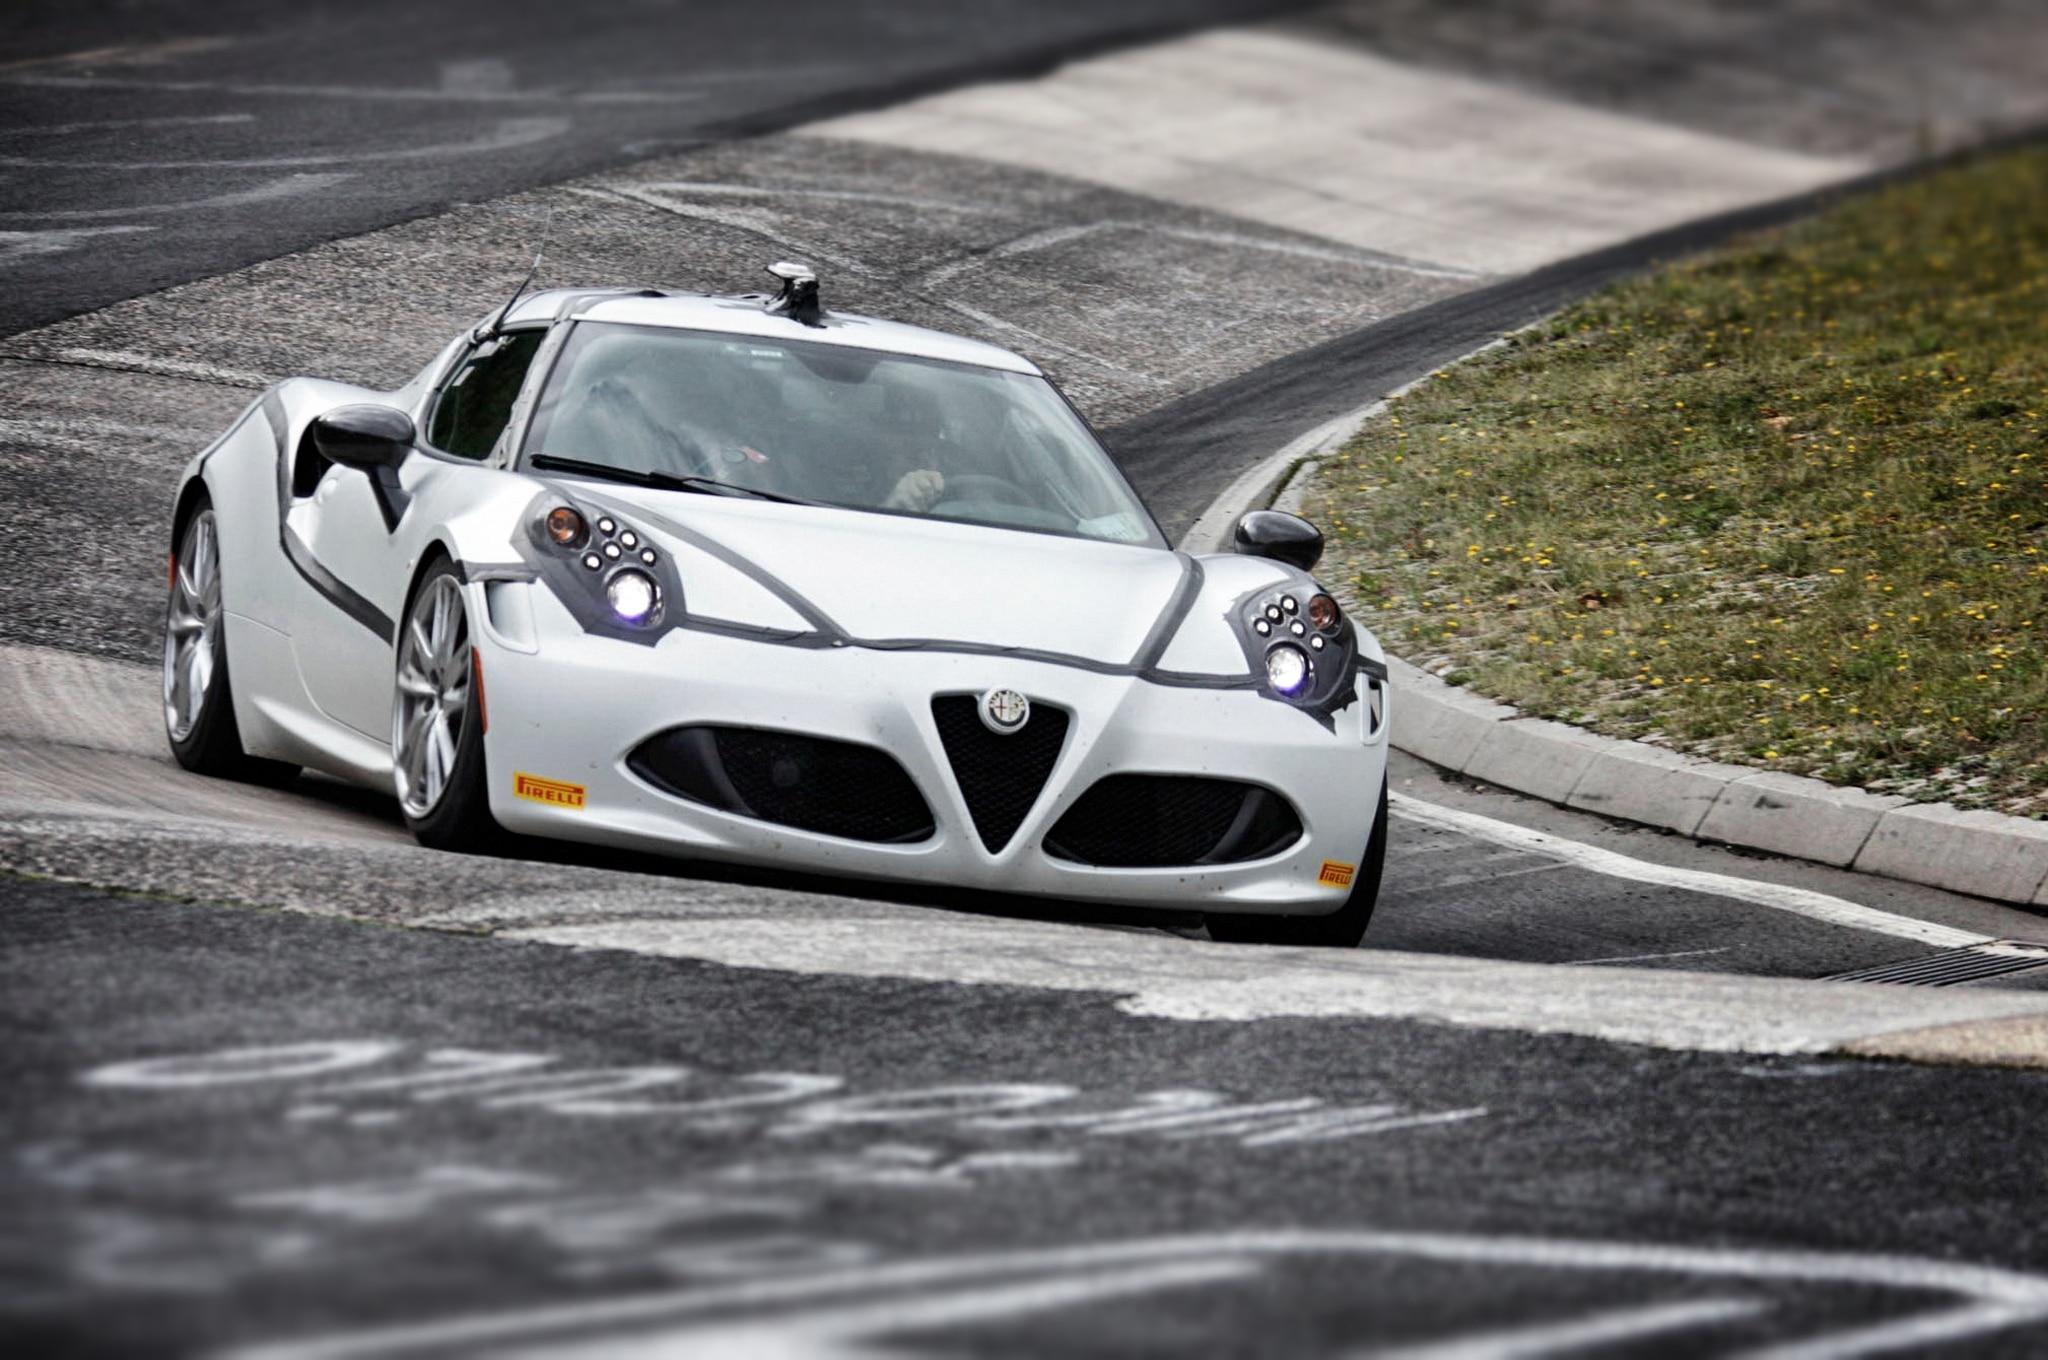 2014 Alfa Romeo 4c Nurburgring 31